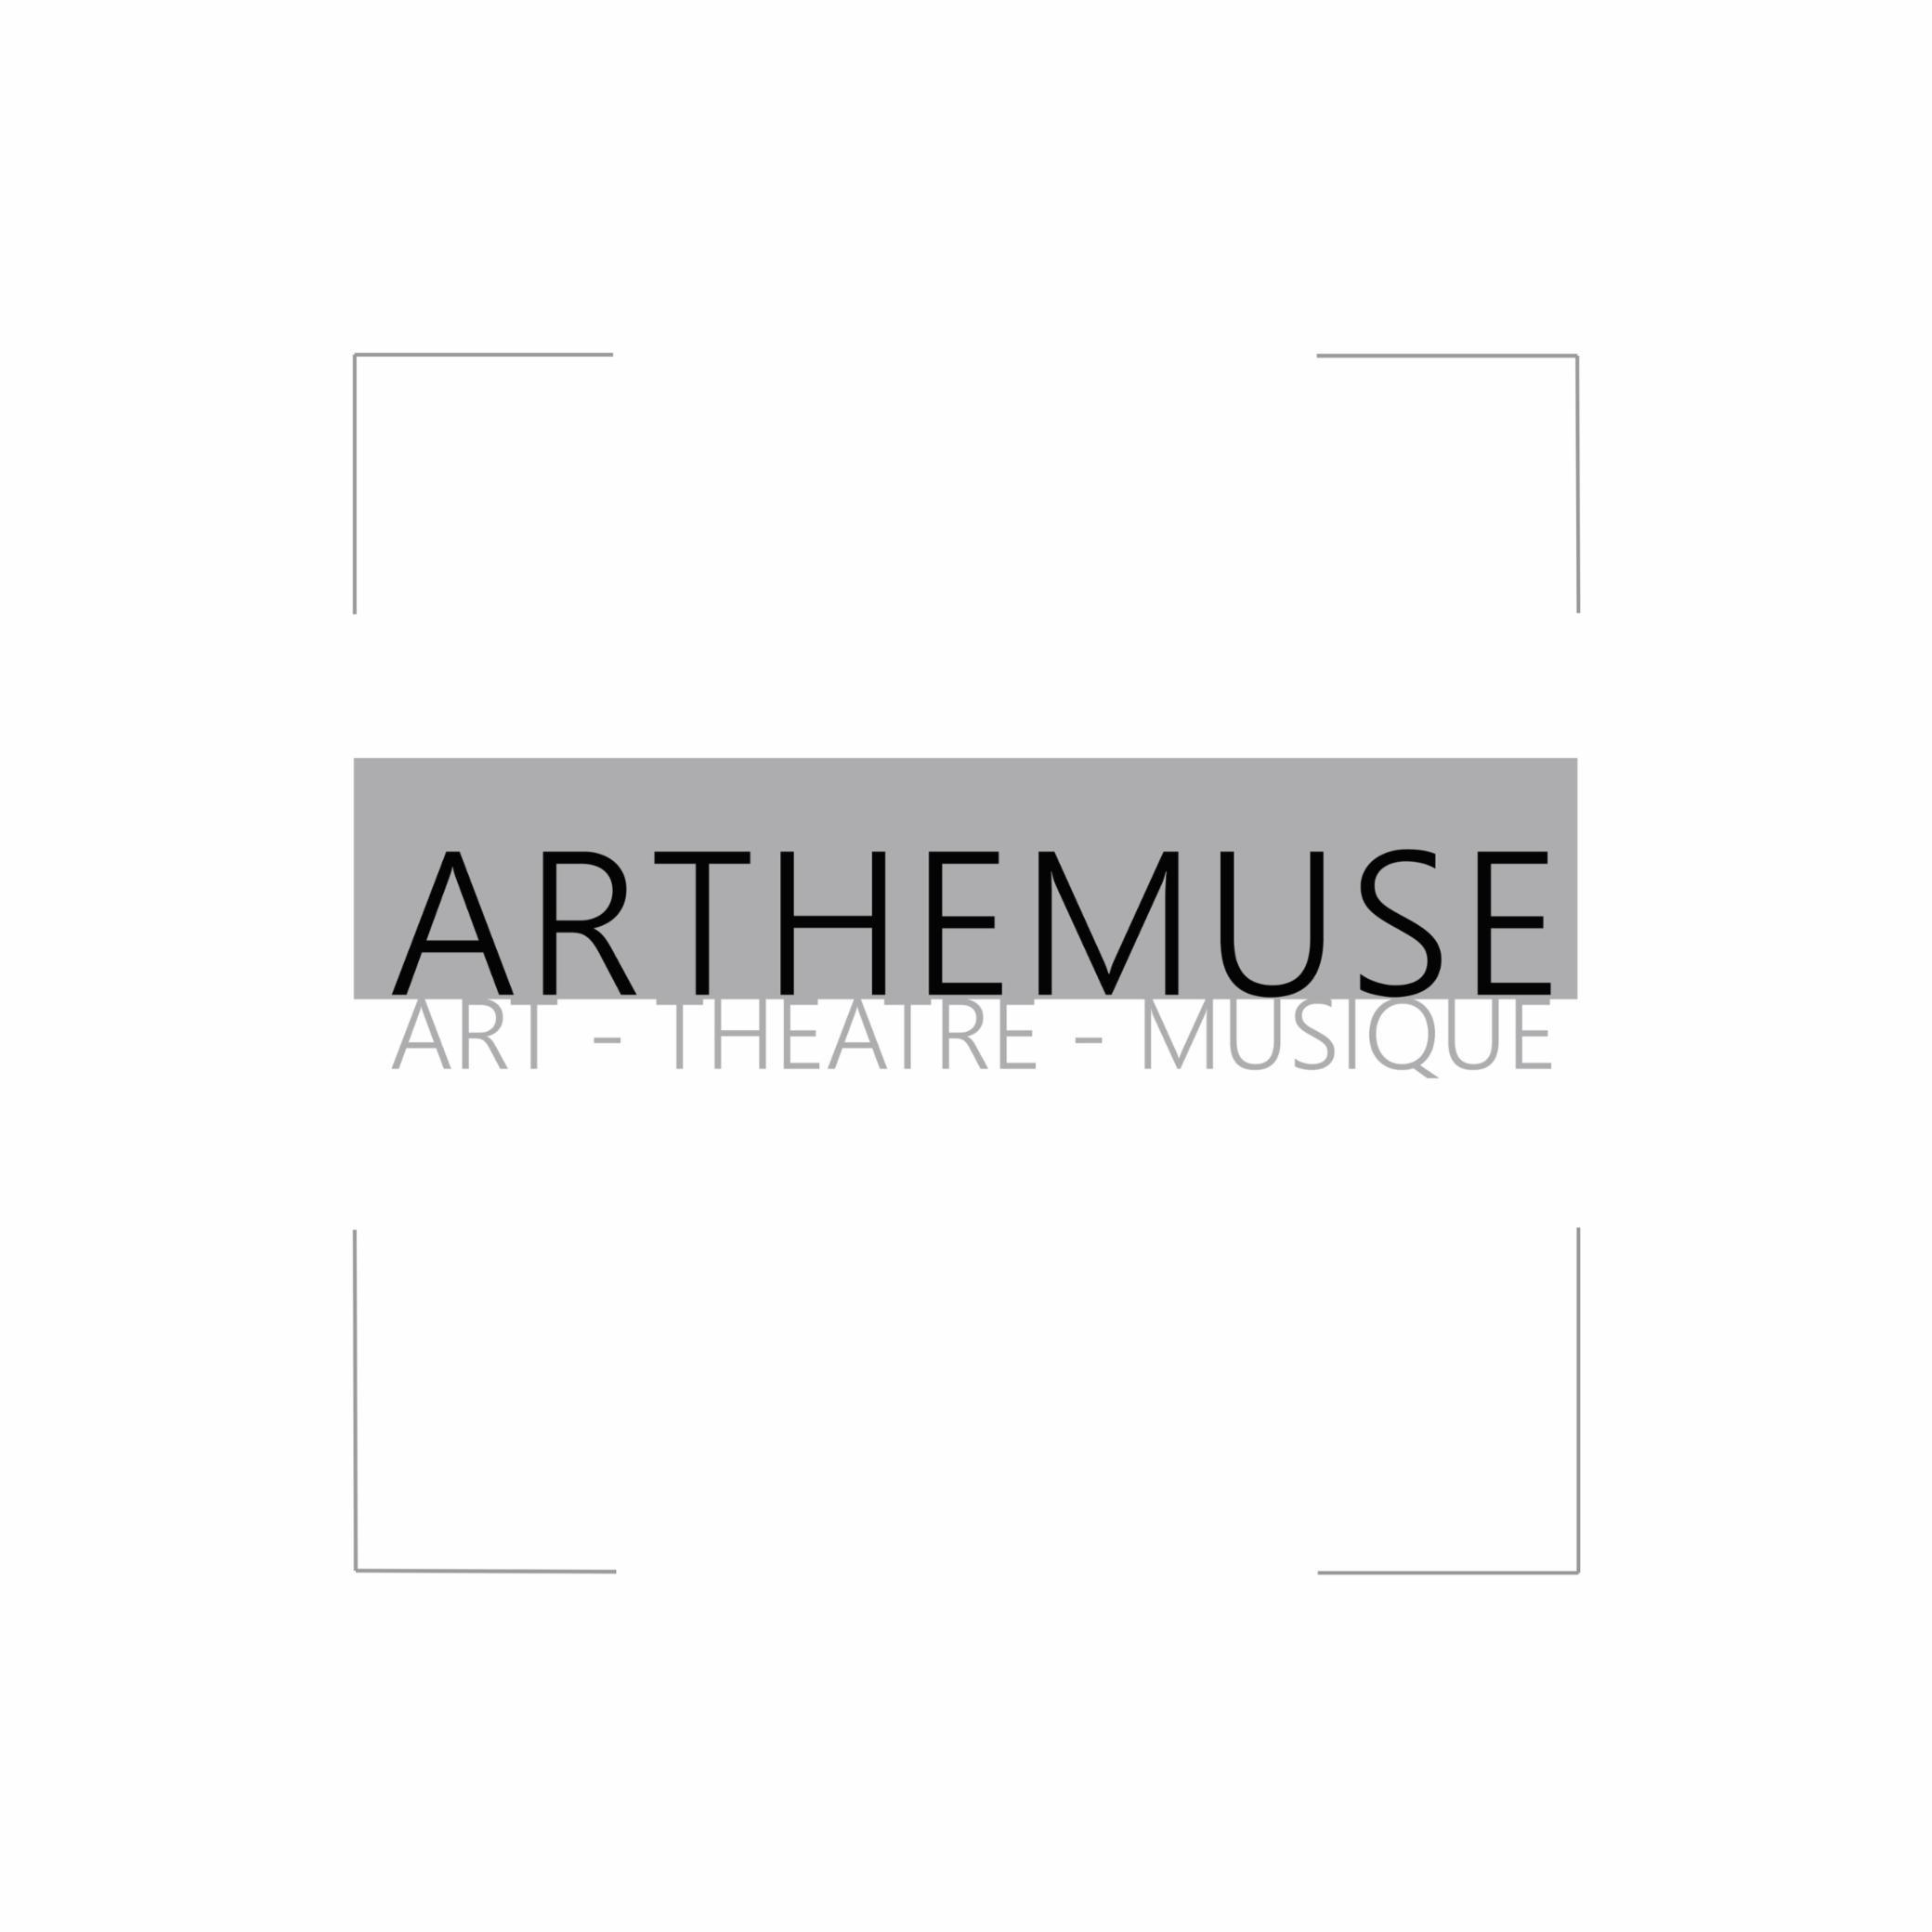 ARTHEMUSE Etoutteville Association culturelle Association culturelle Association culturelle